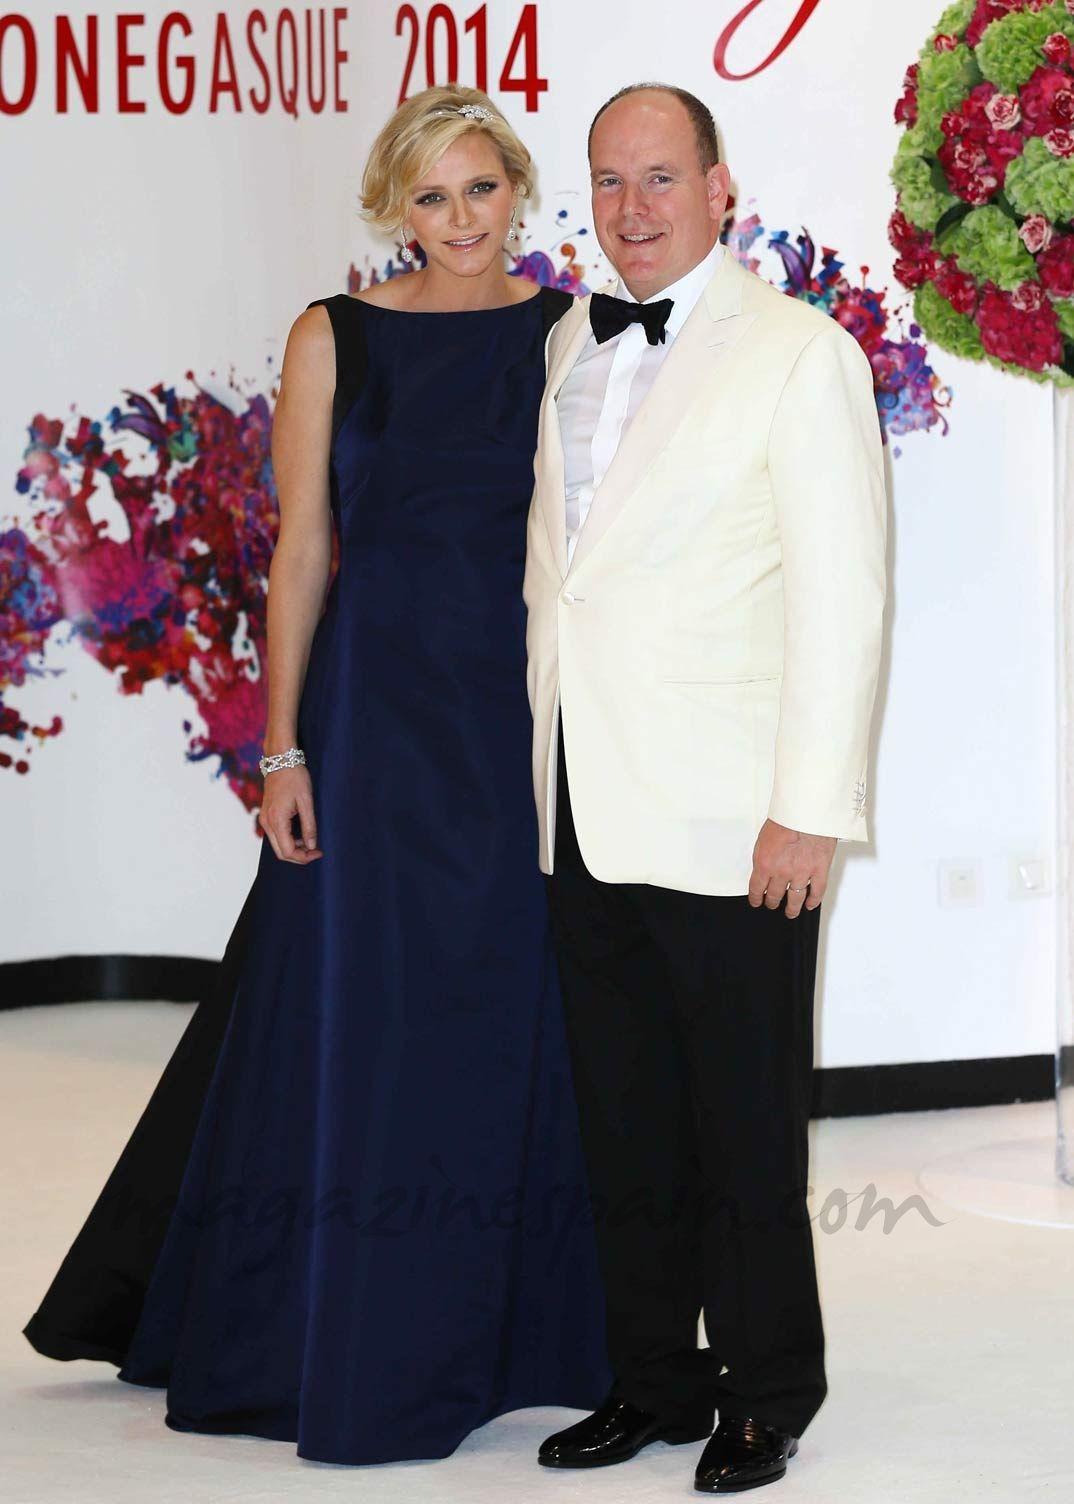 Princess-Charlene-and-Prince-Albert-II-of-Monaco